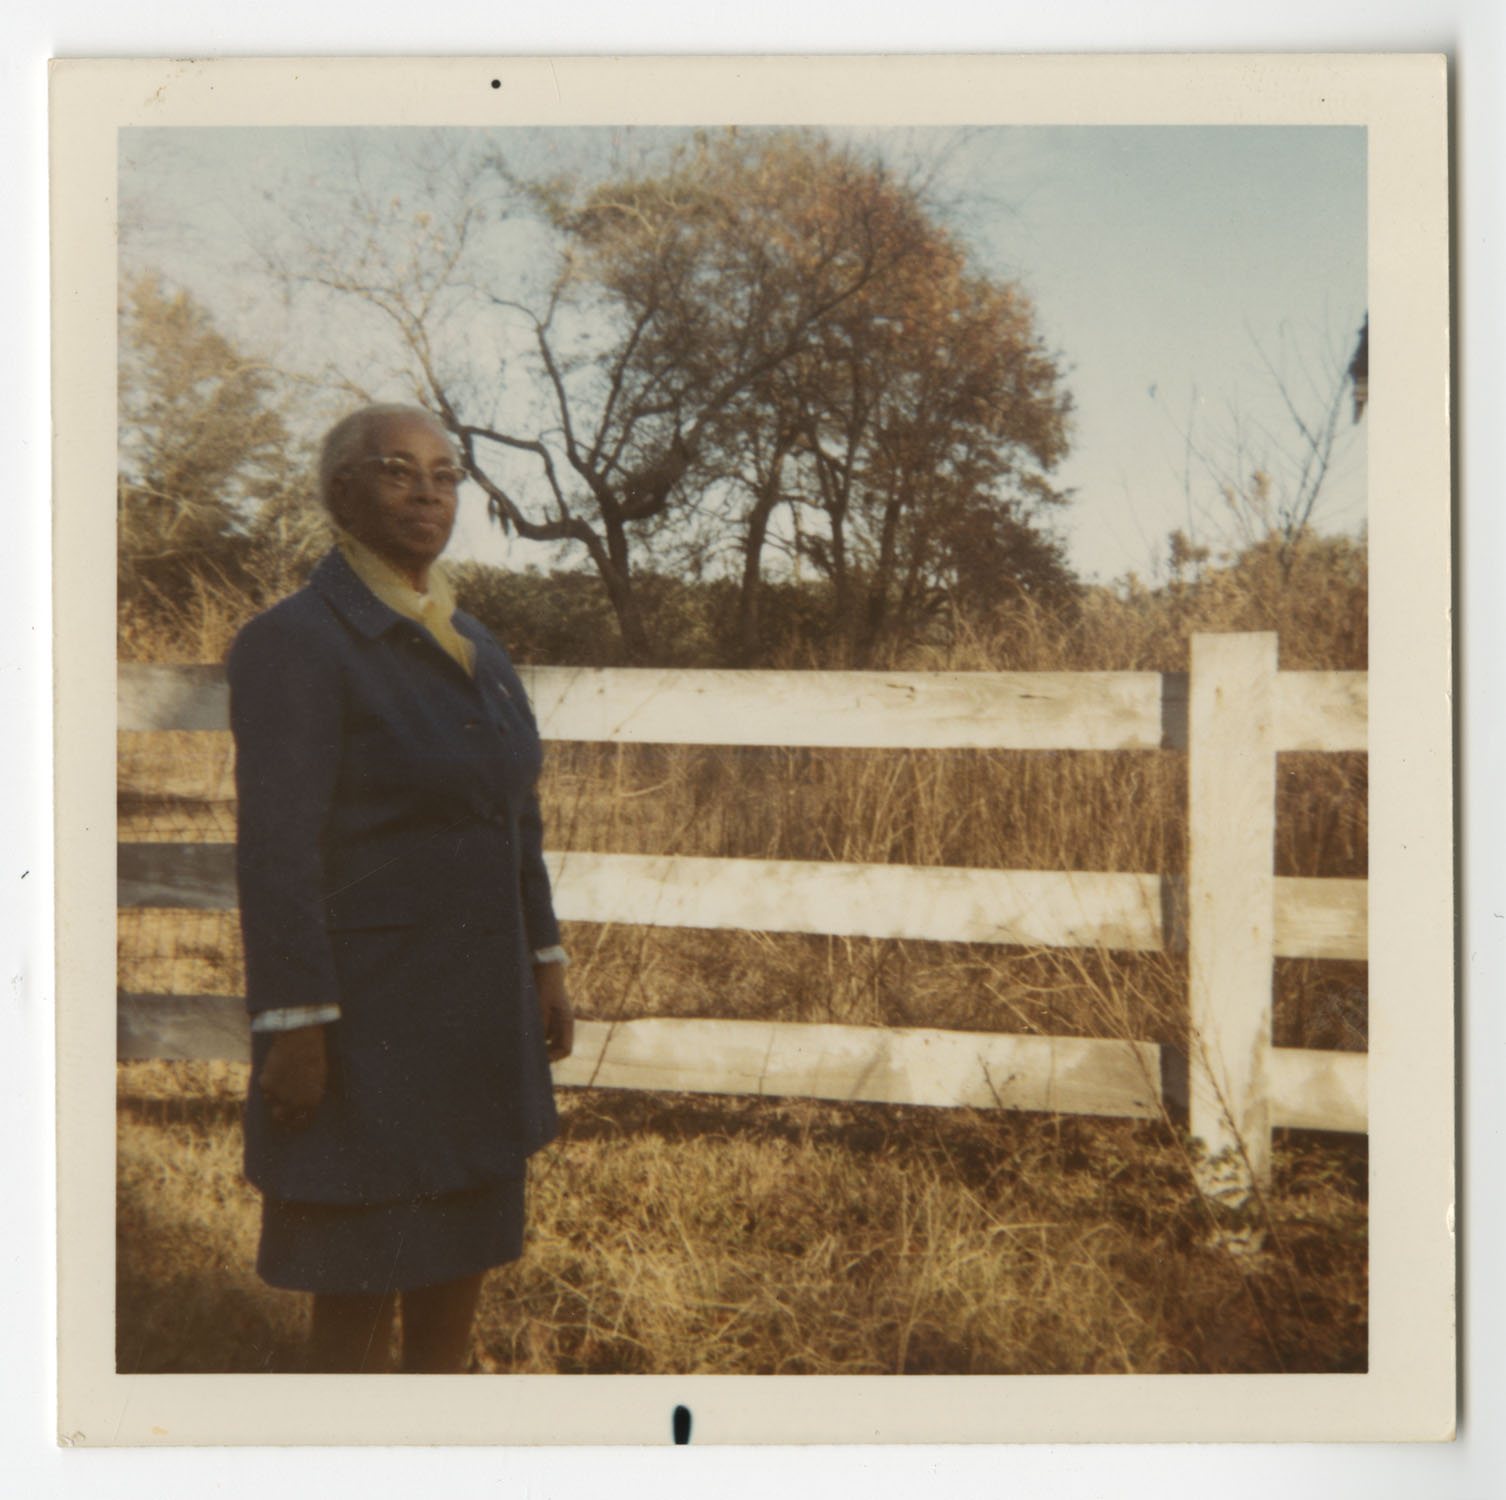 Septima P. Clark, December 7, 1971